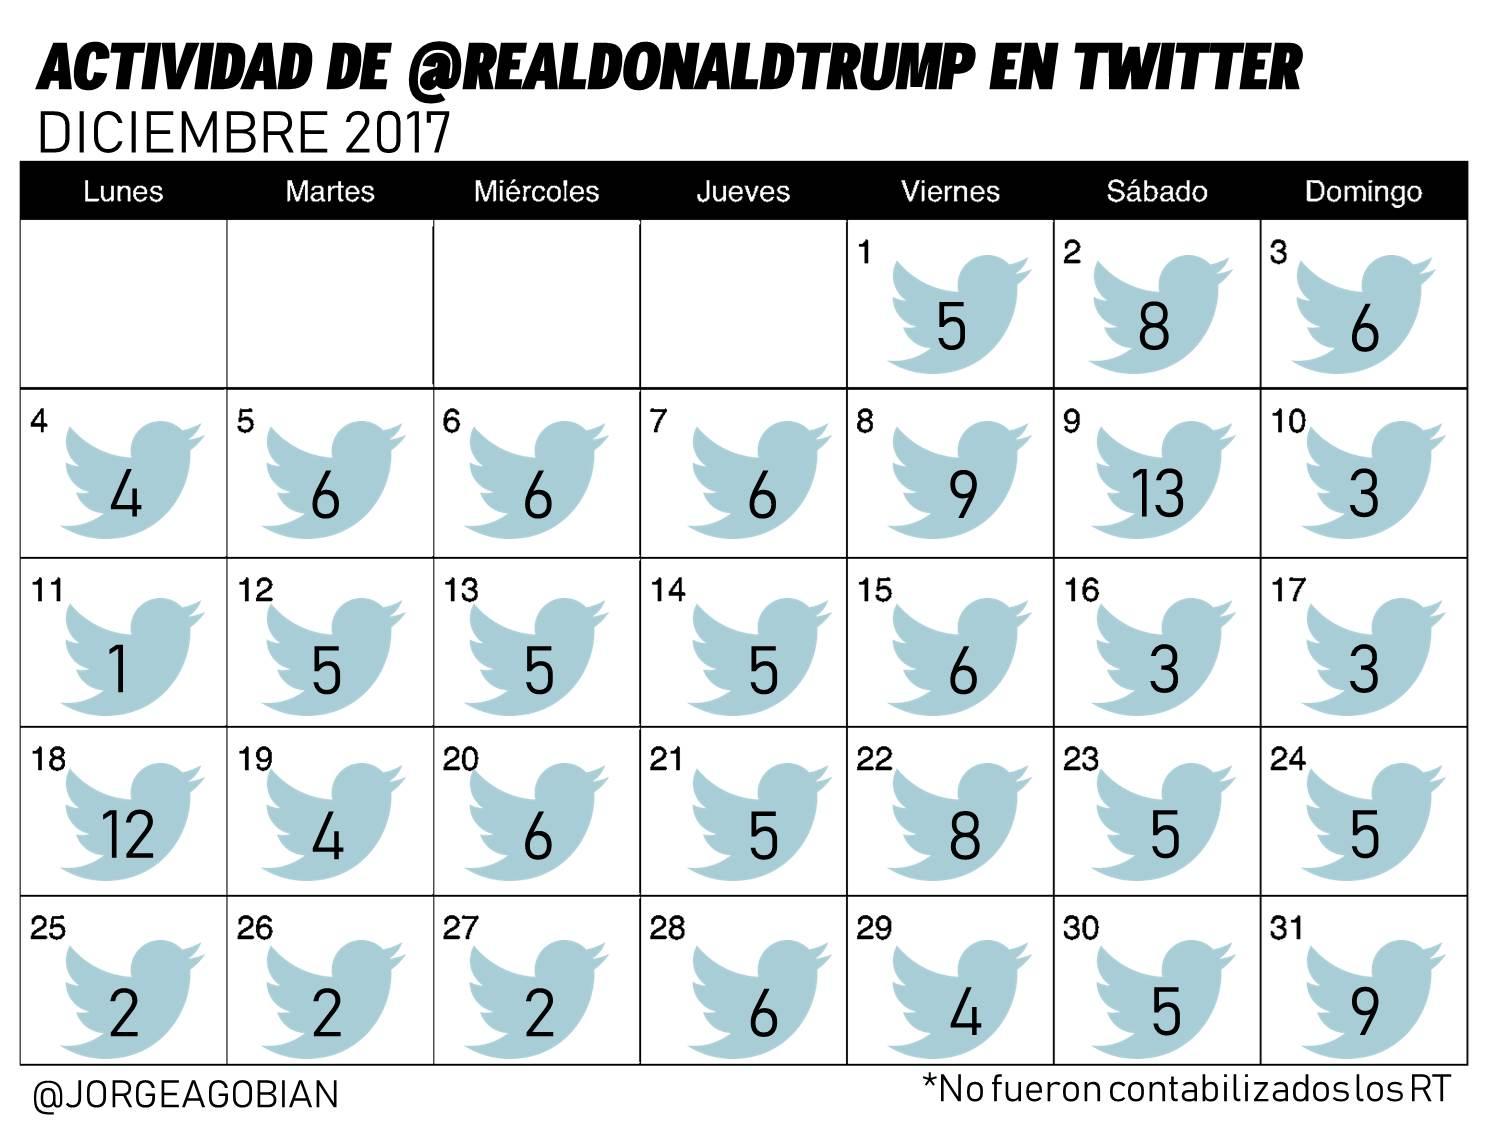 actividad de trump en twitter diciembre 2017